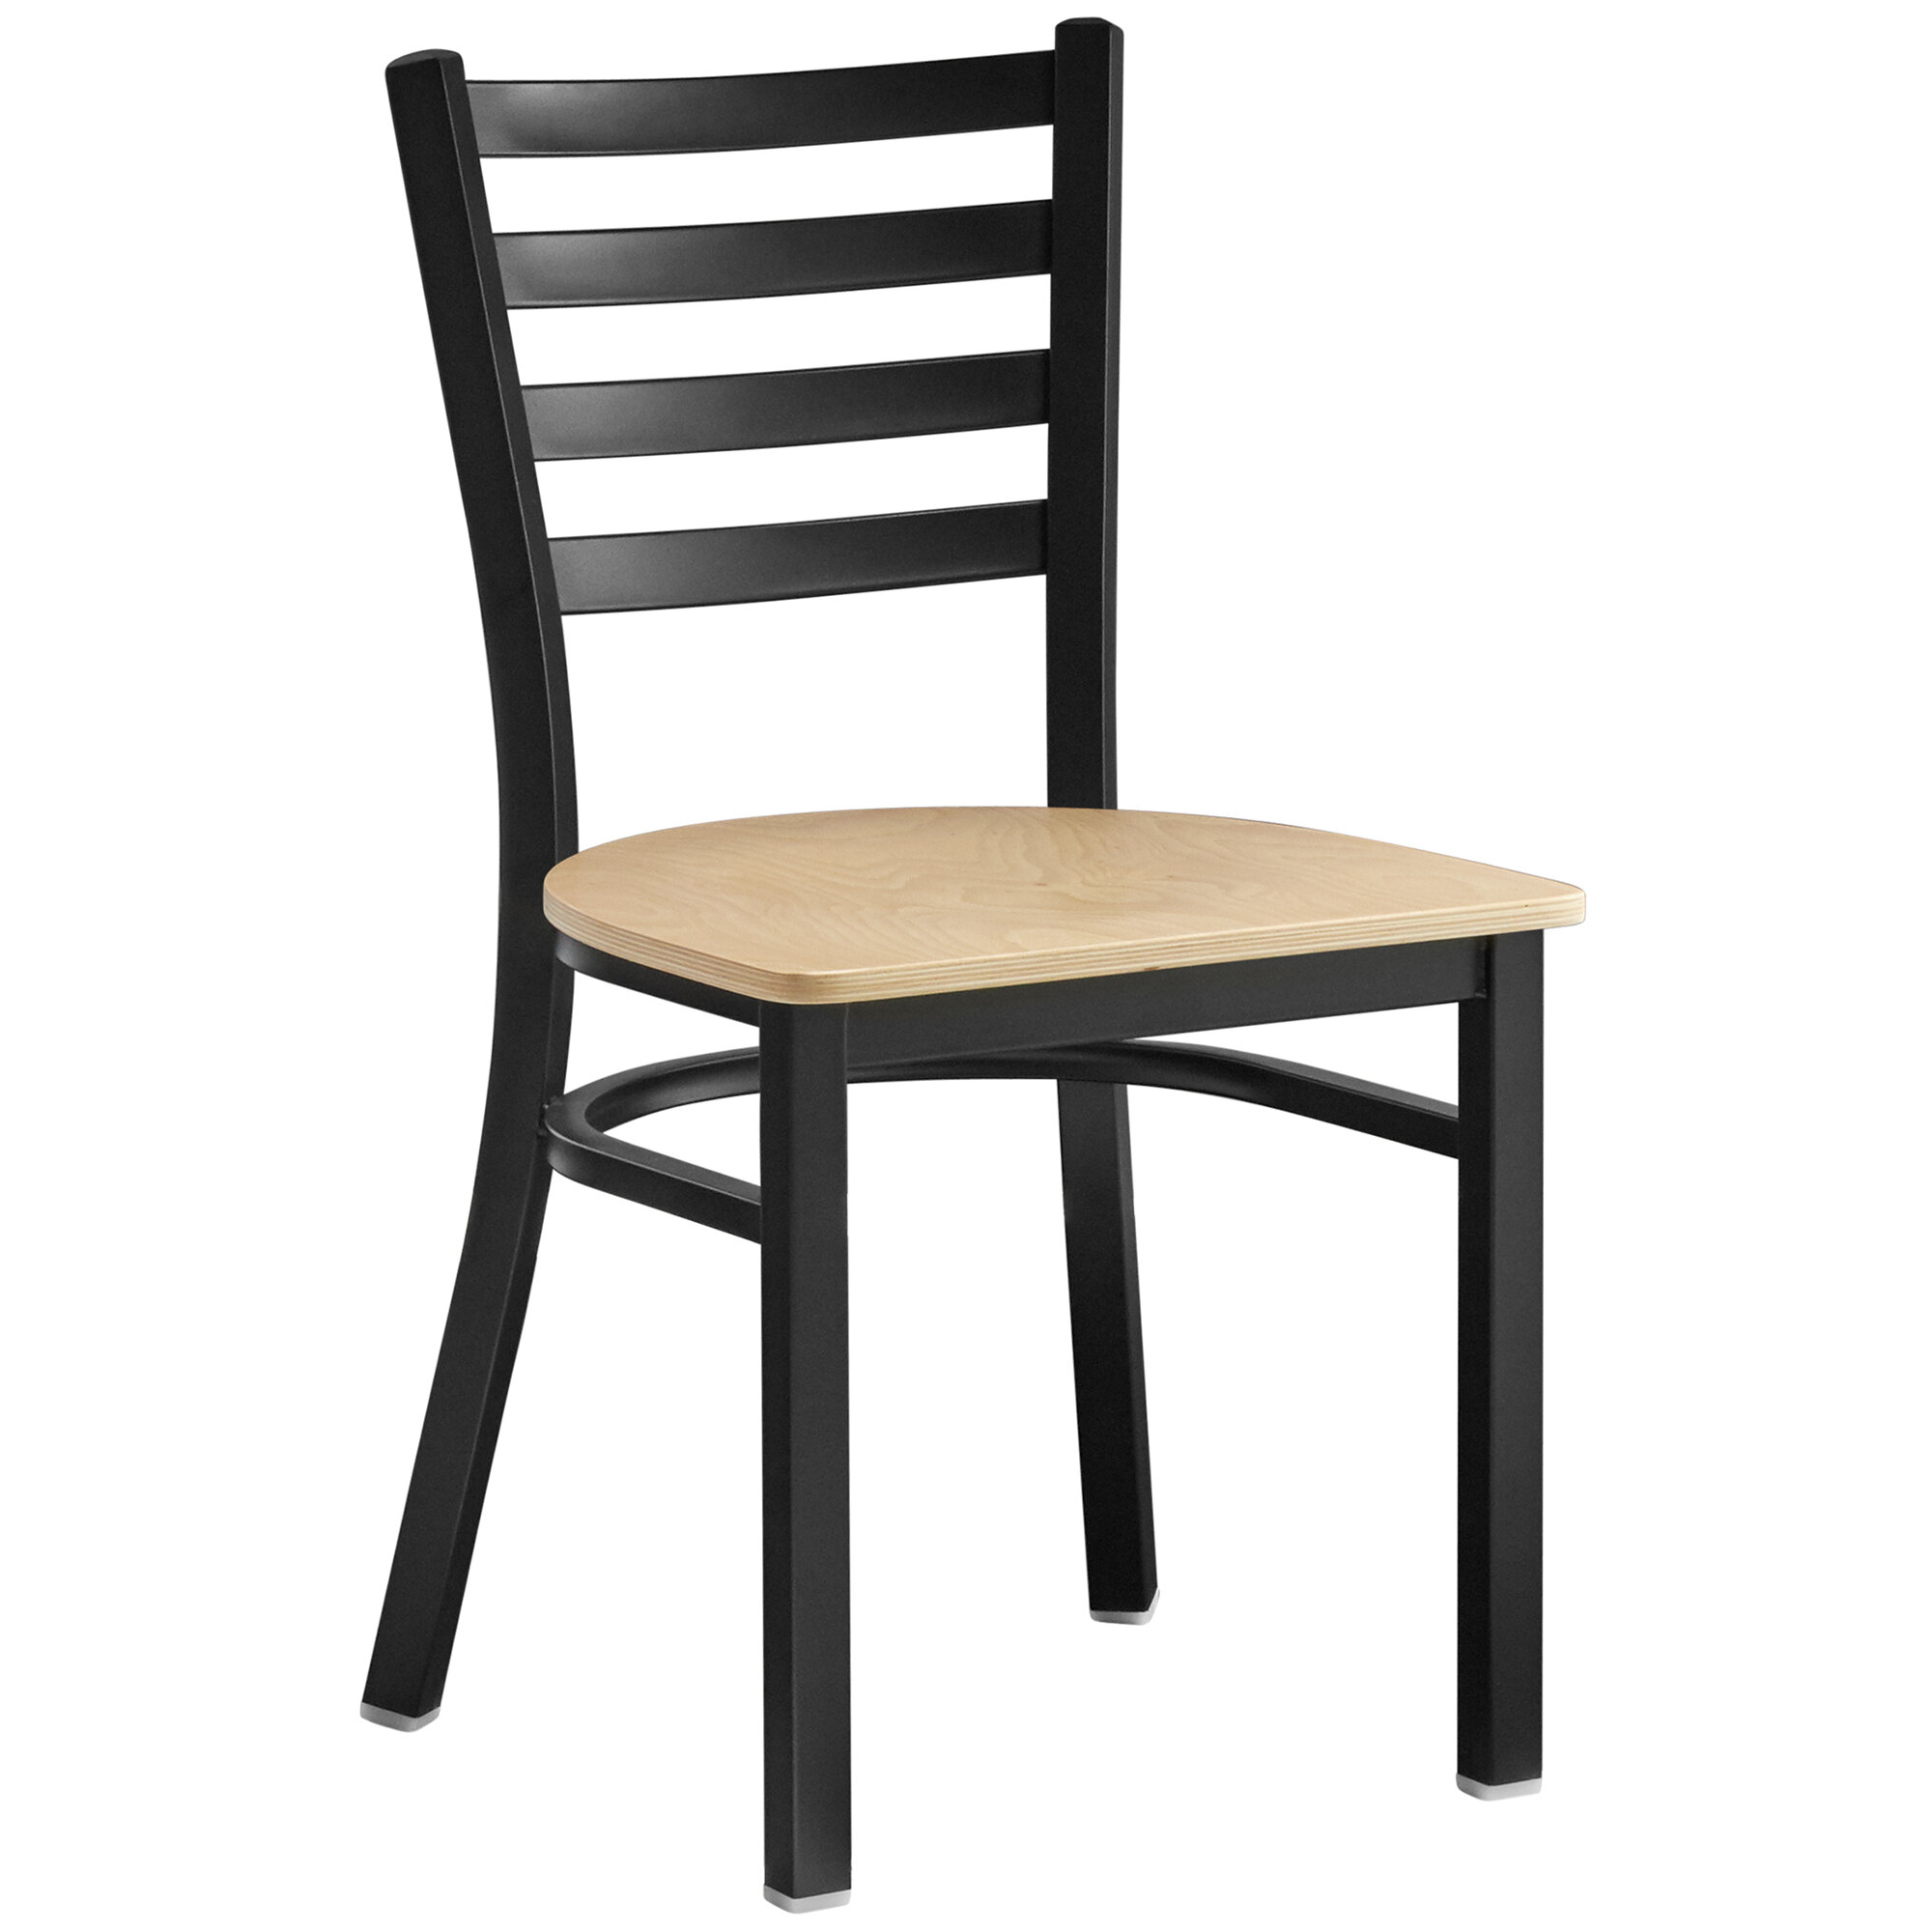 #198 - Black ladder Back Design Restaurant Metal Chair with Natural Wood Seat